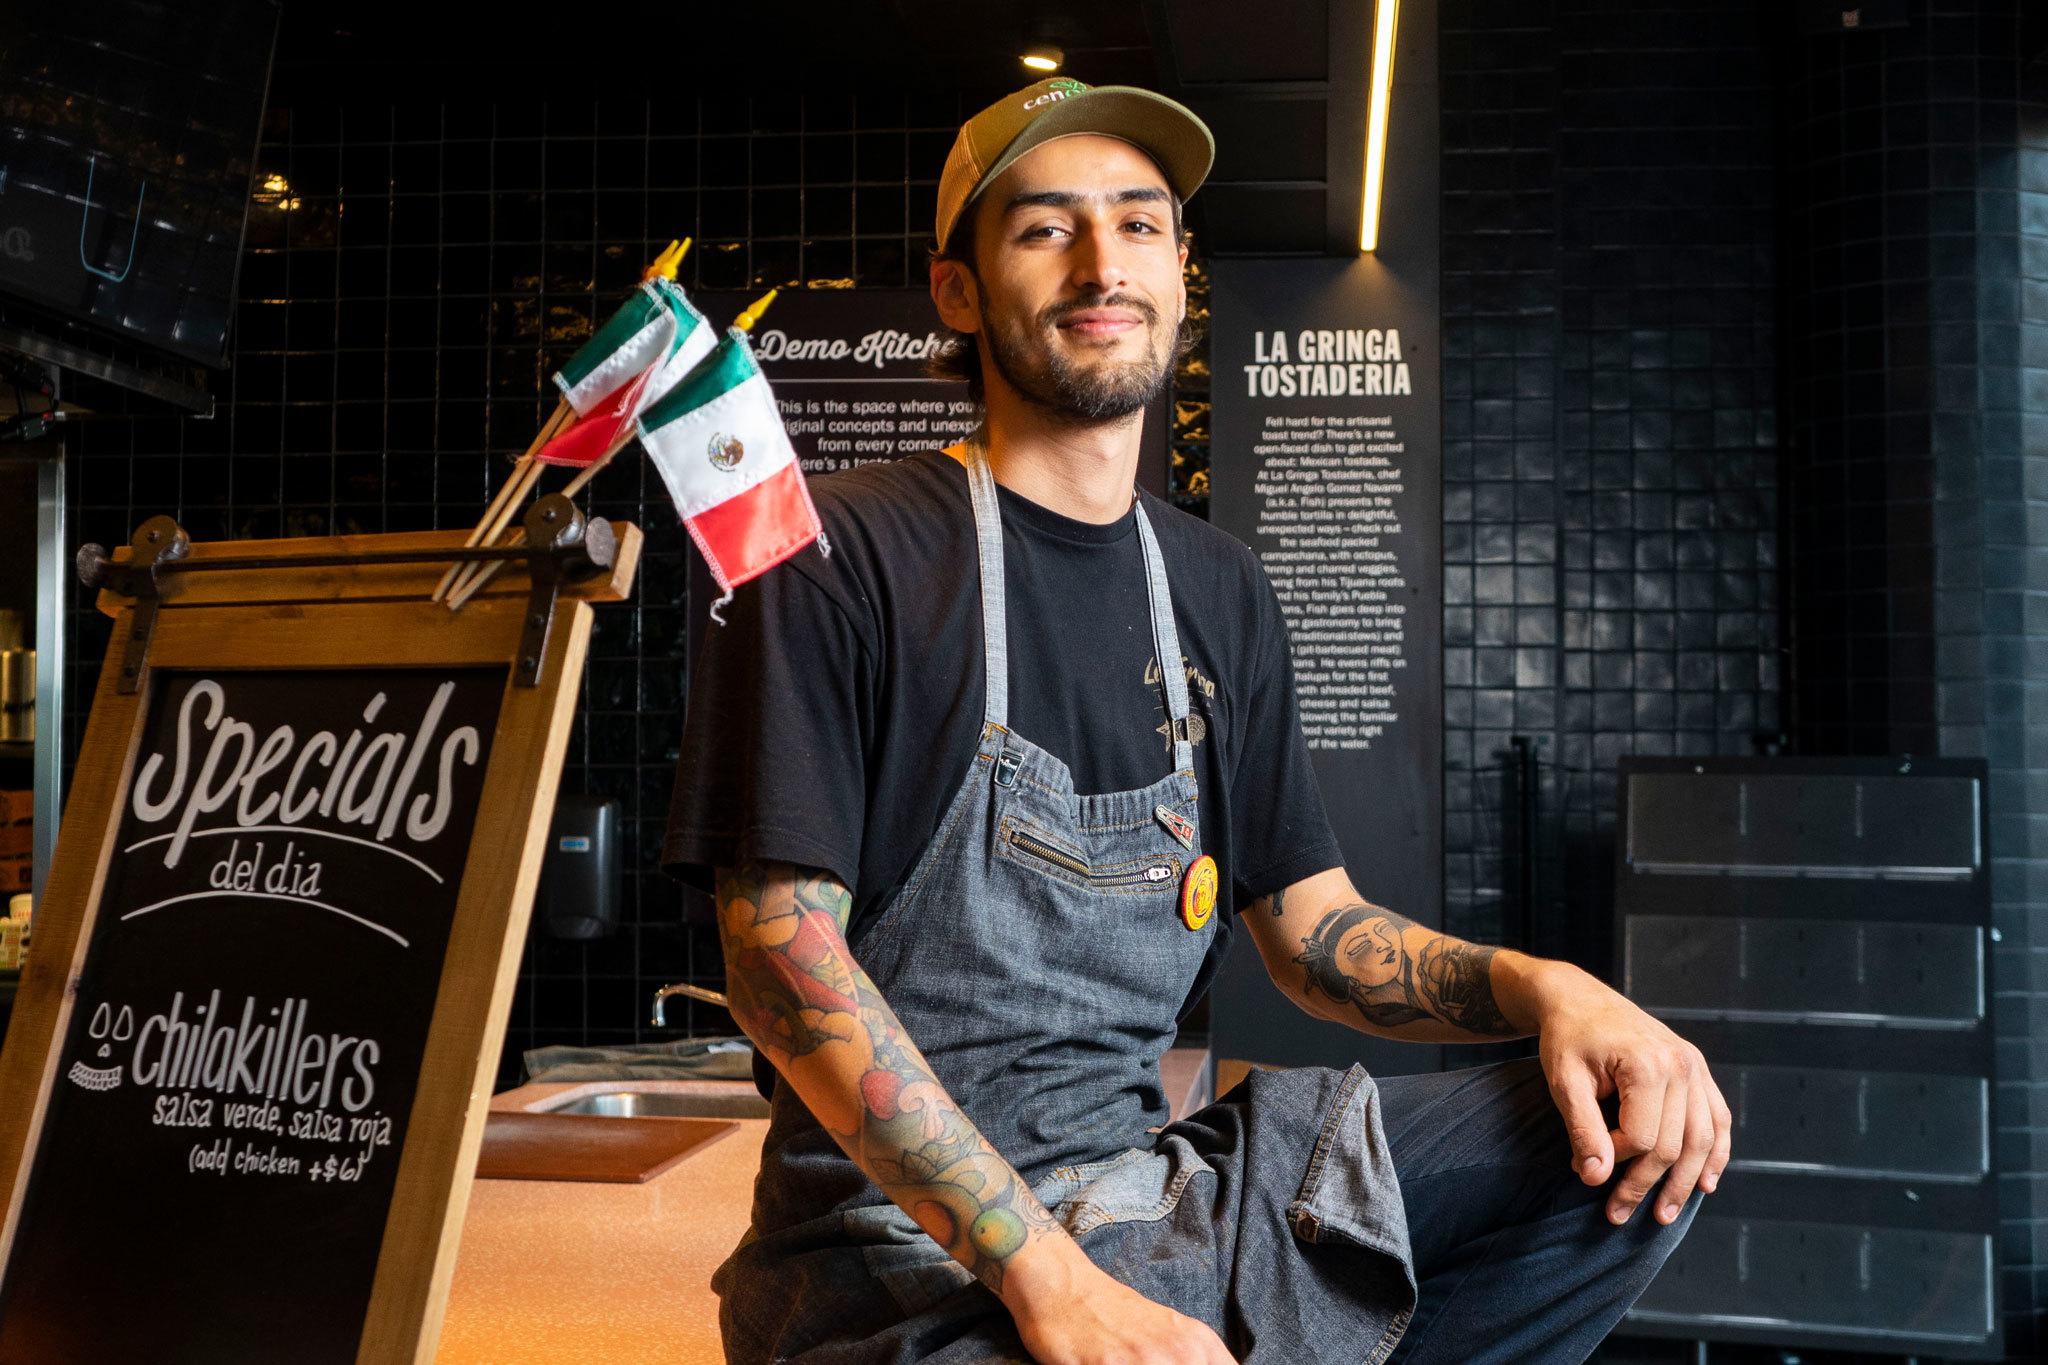 Chef Fish La Gringa Tostaderia